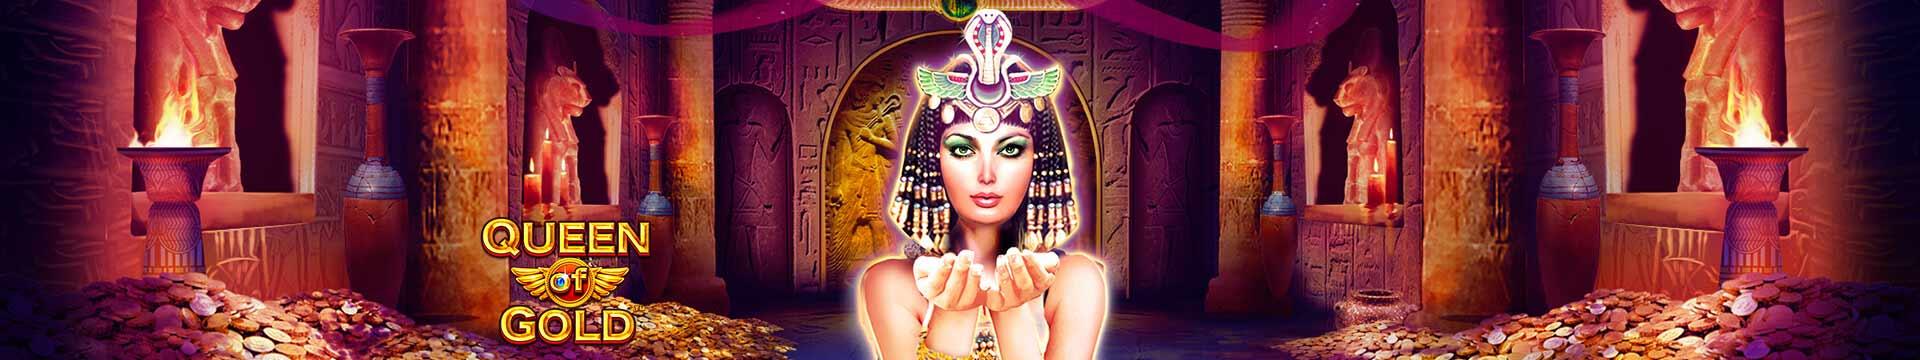 Slider Banner - Queen of Gold